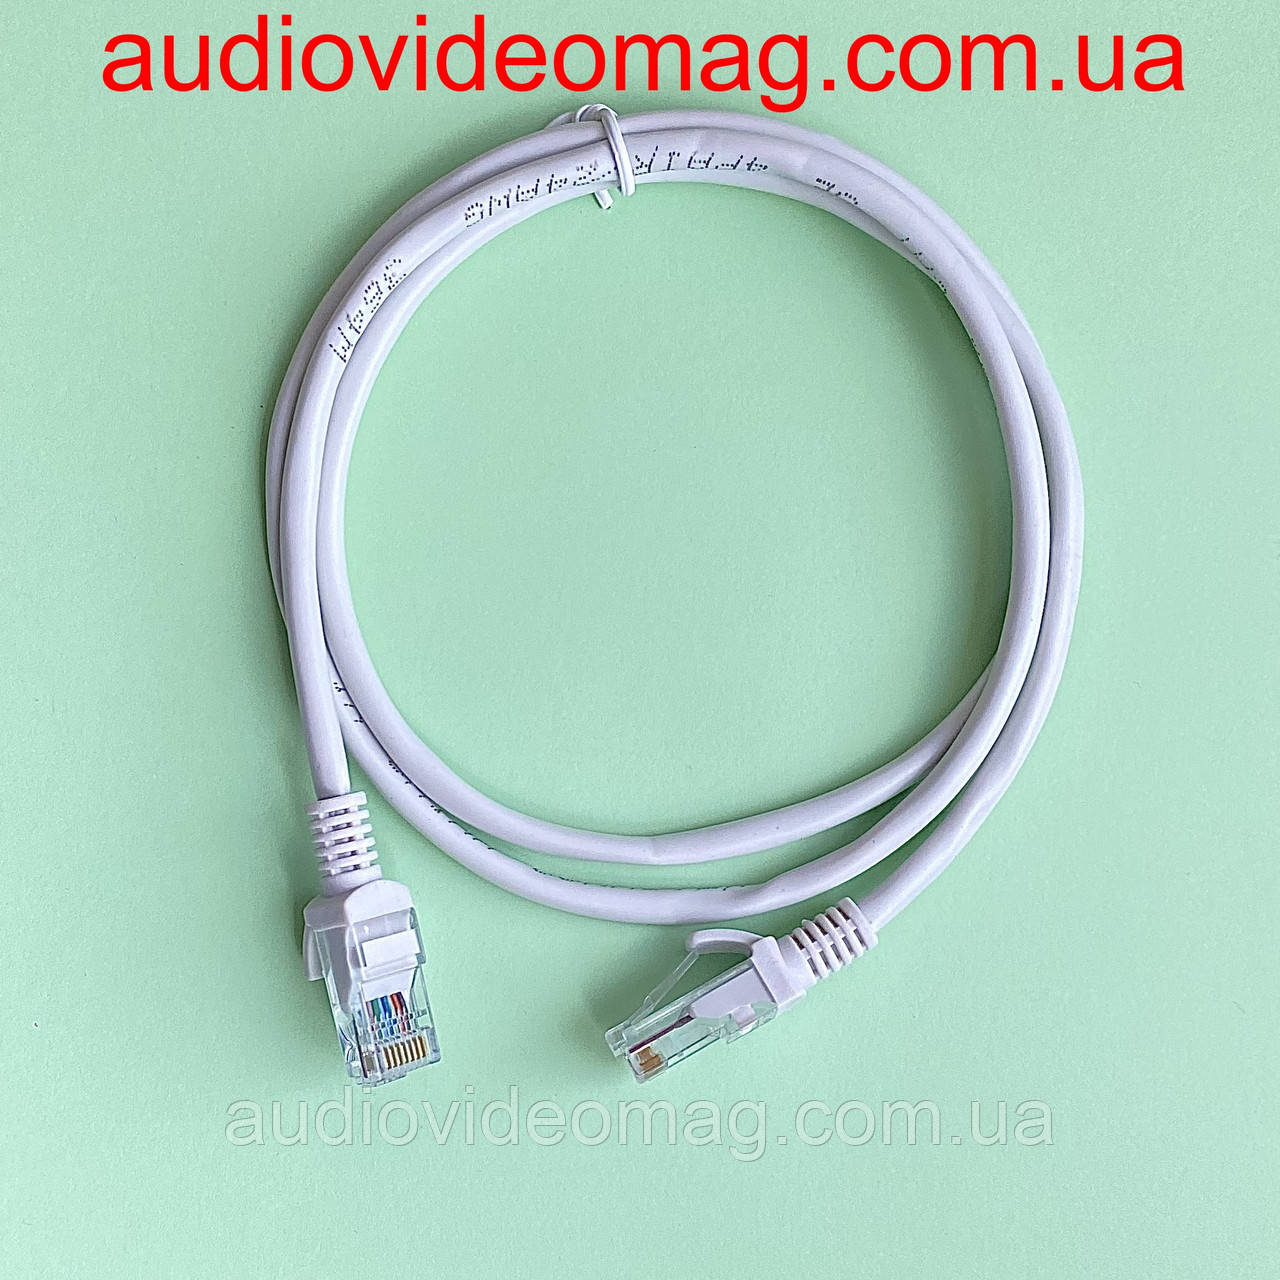 Патч-корд RJ-45 UTP 5e, длина 1 метр, интернет-кабель